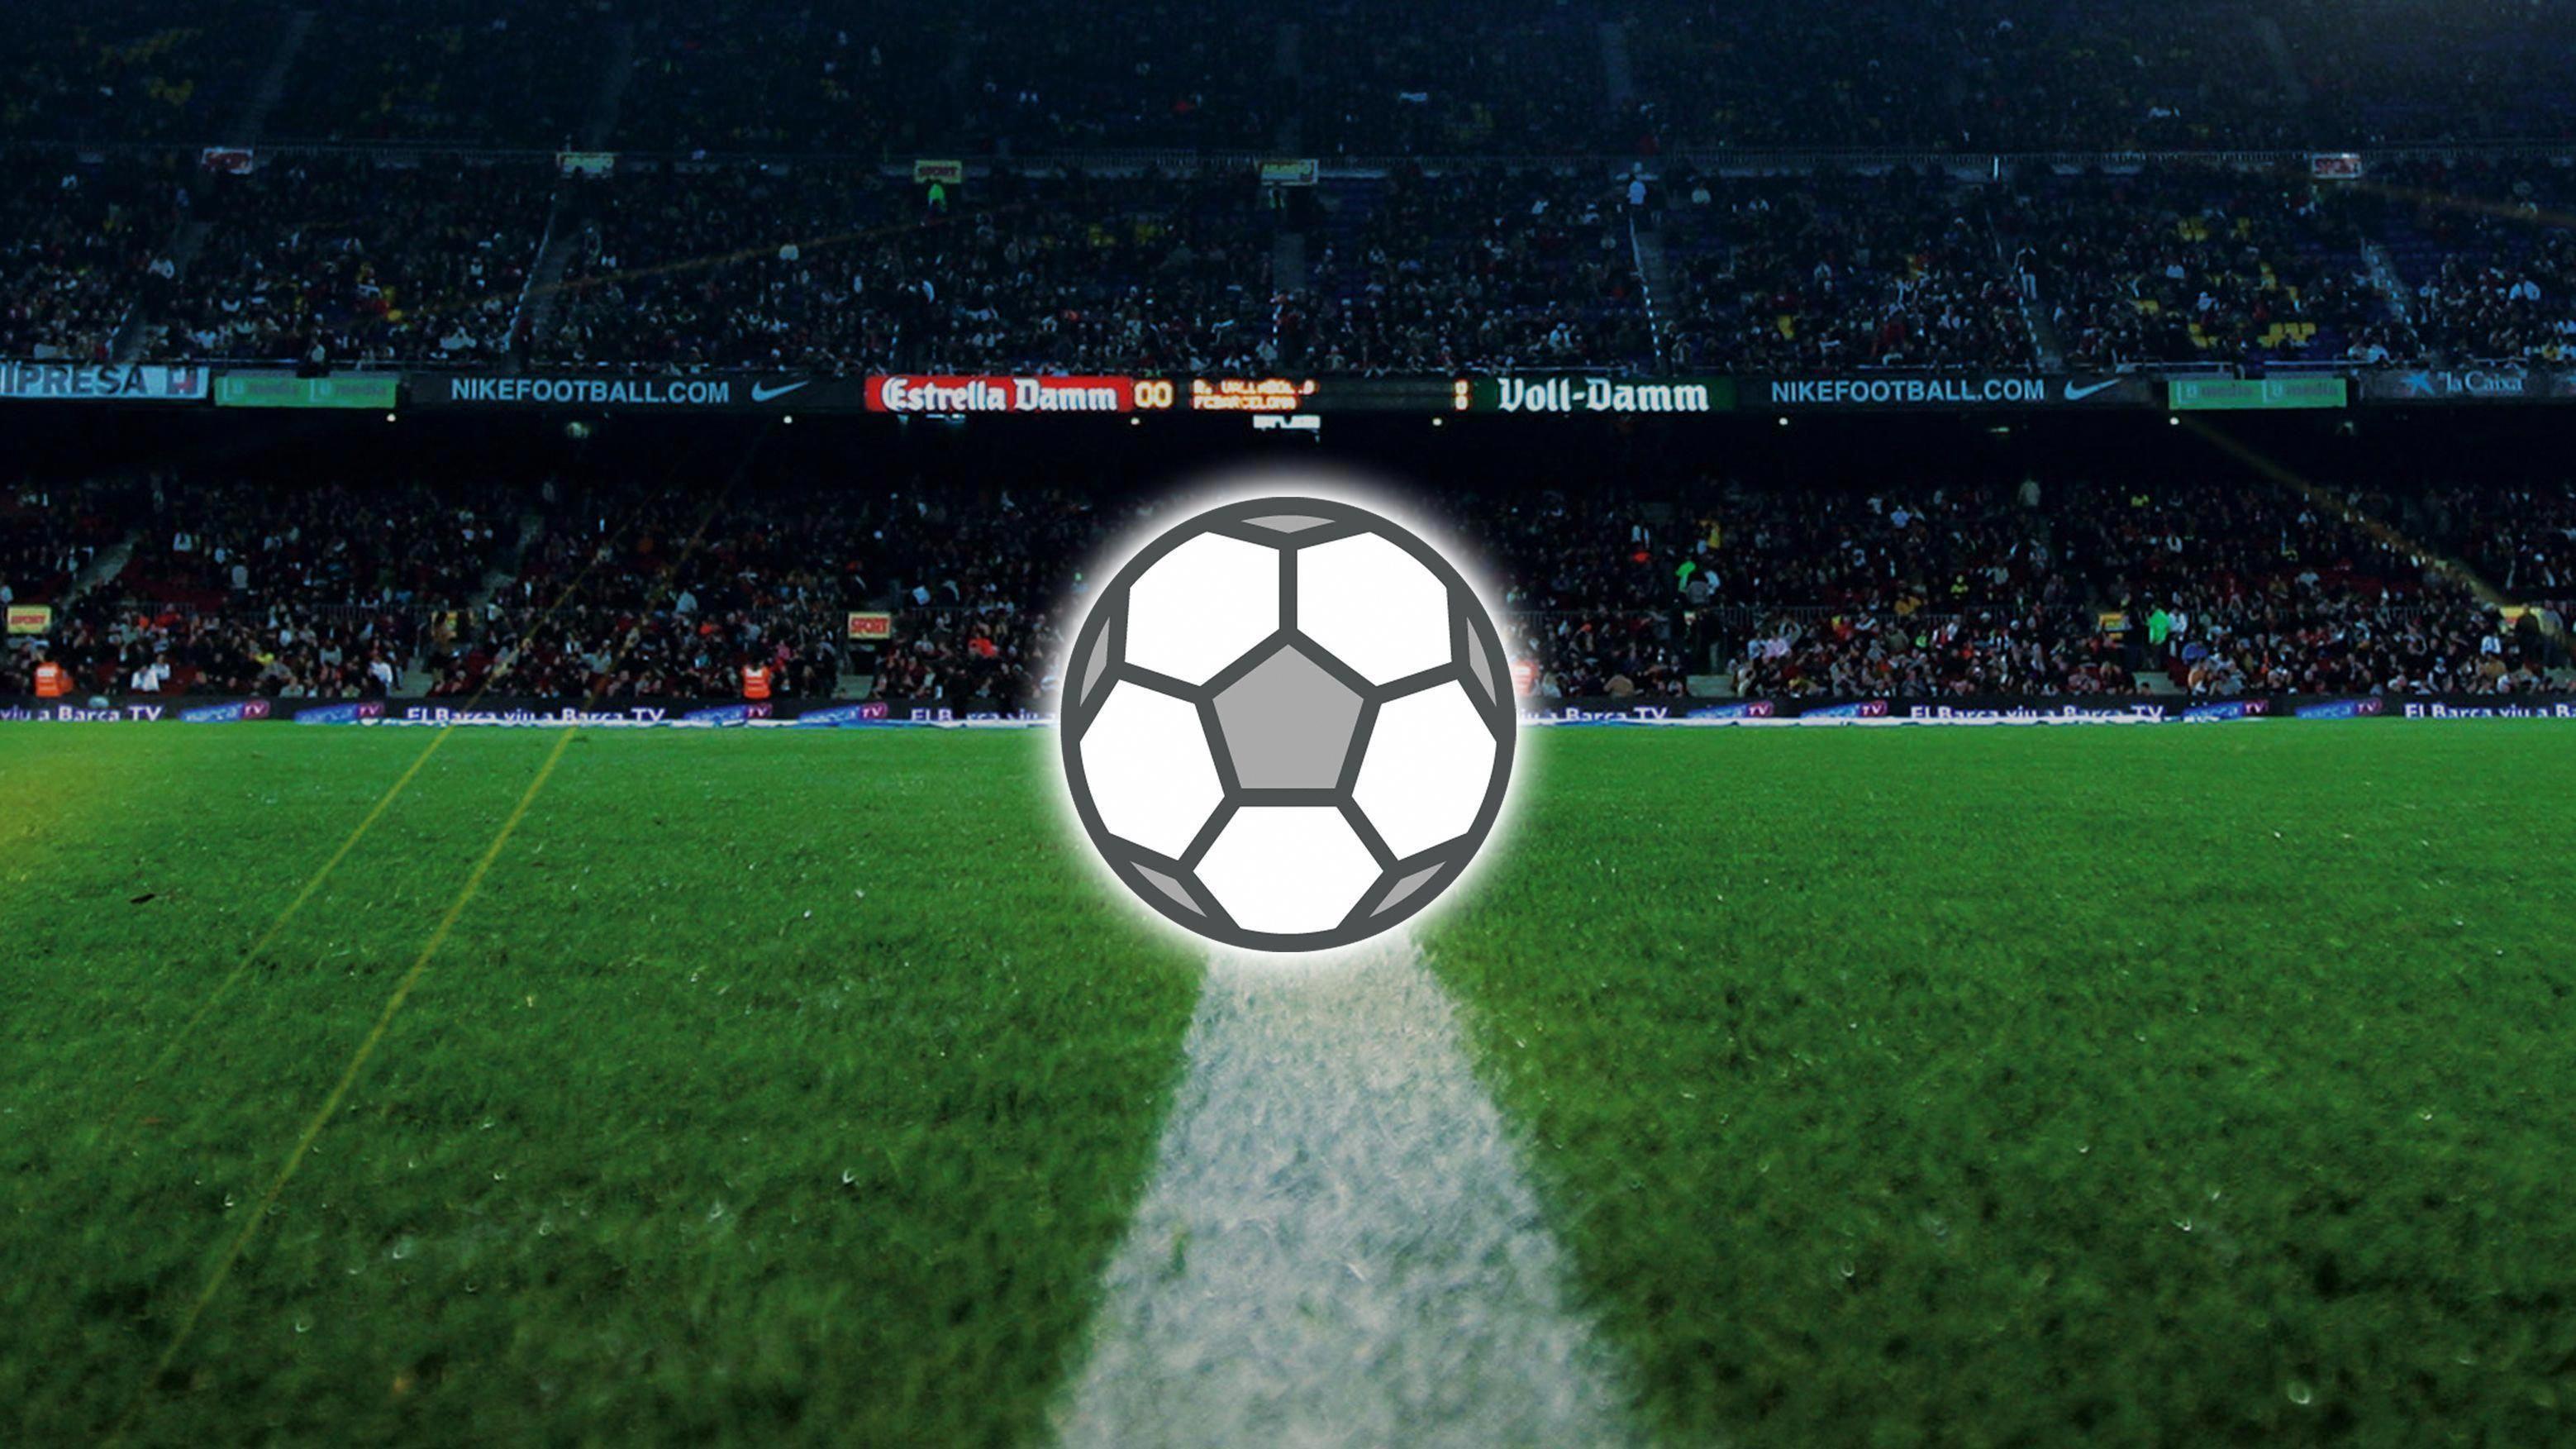 soccerballiconiconssoccersgamegameslogologos